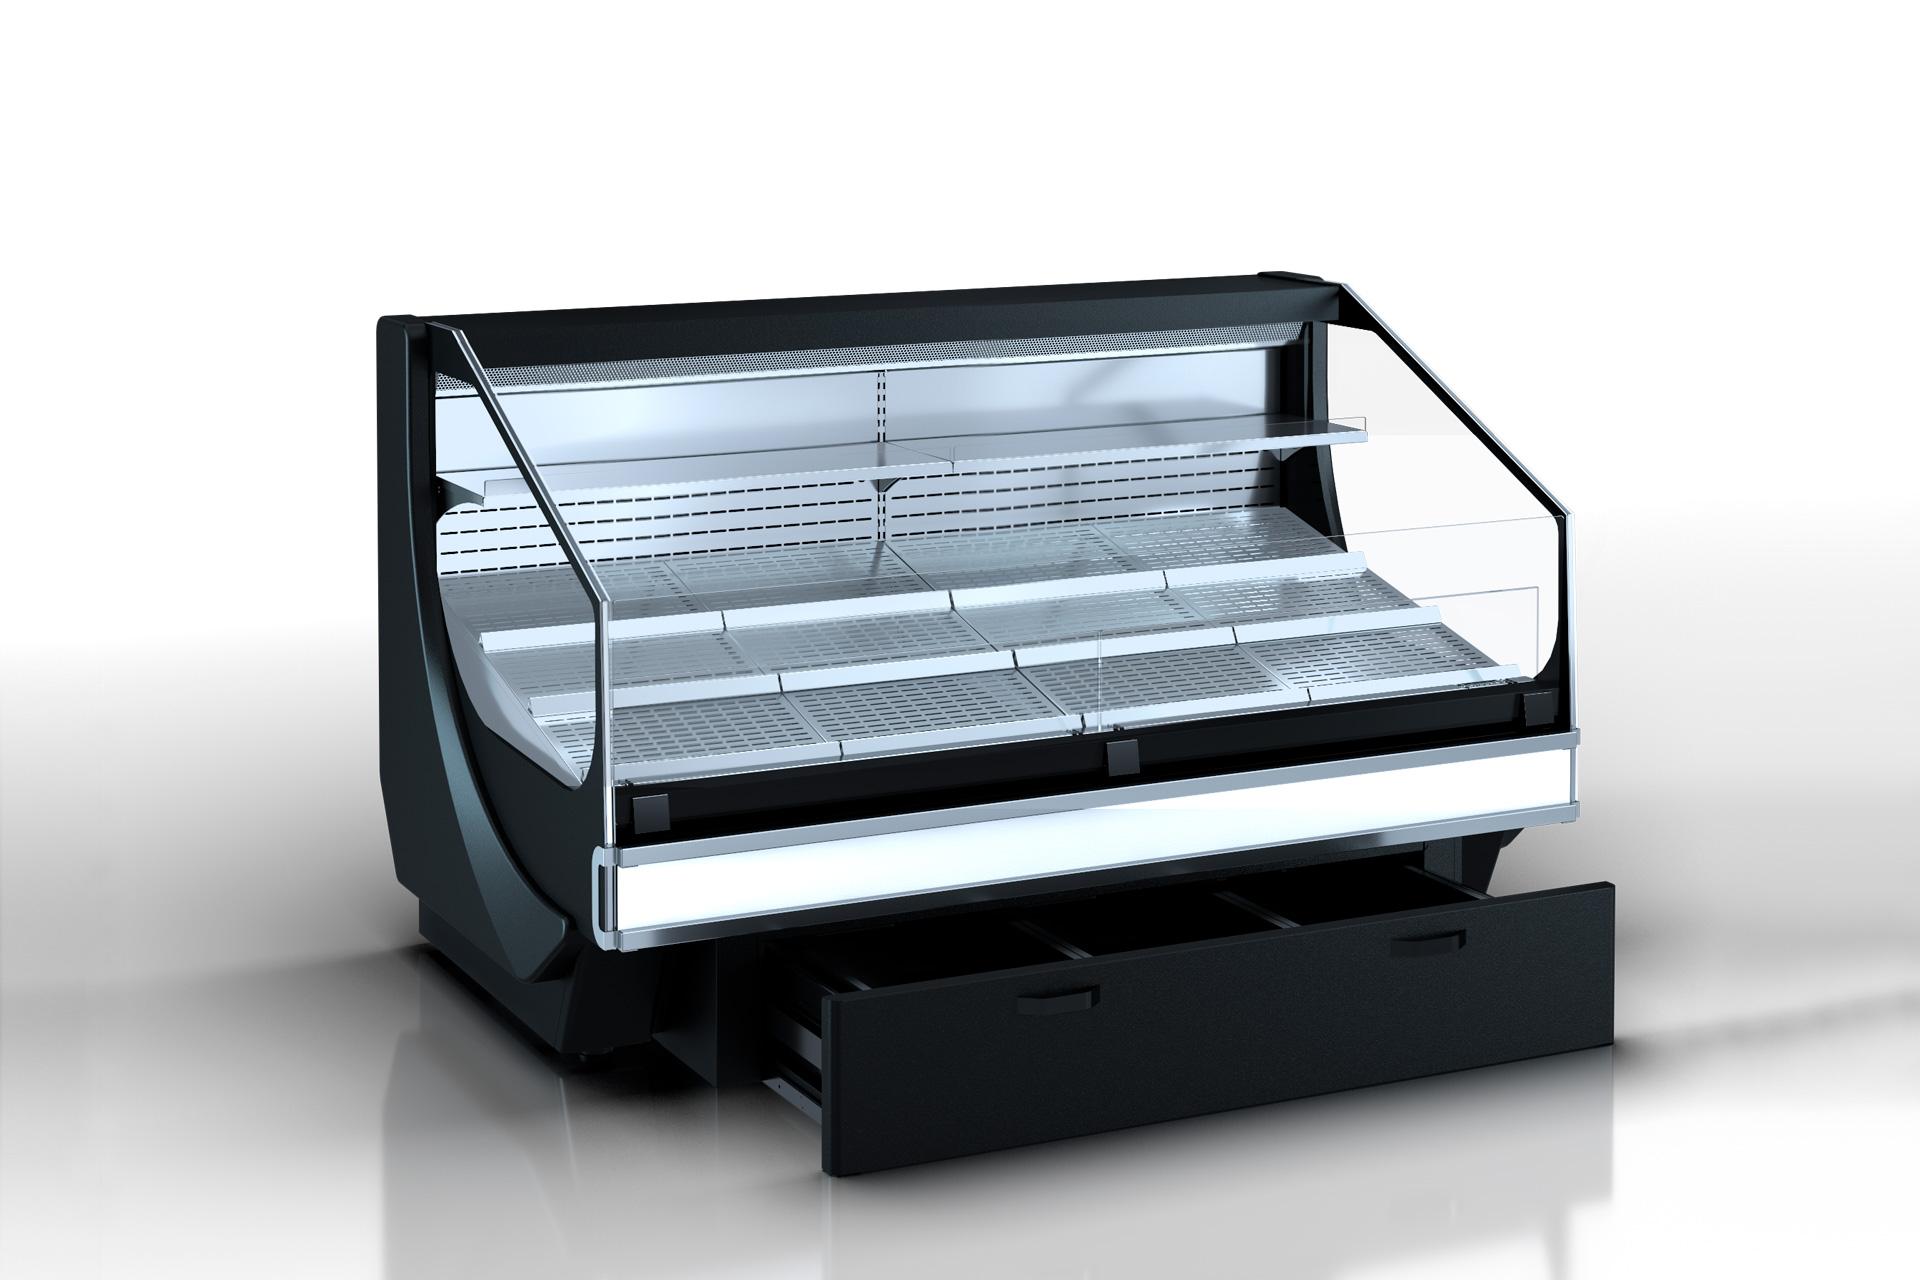 Холодильна вітрина Missouri cold diamond MC 115 cascade VF self 121-DBA